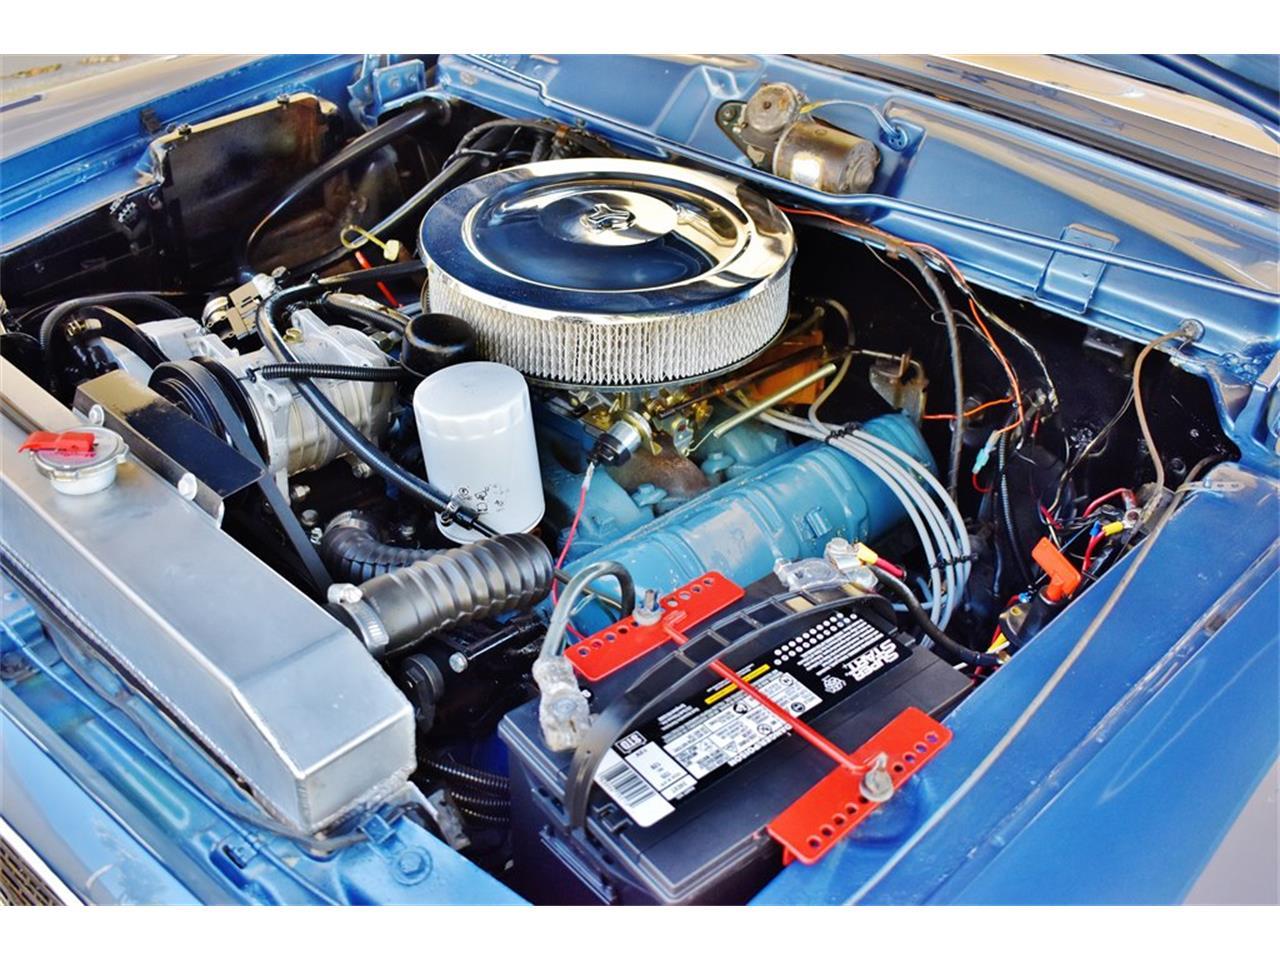 Large Picture of Classic 1960 Studebaker Lark located in Lakeland Florida - $29,900.00 - PKN0